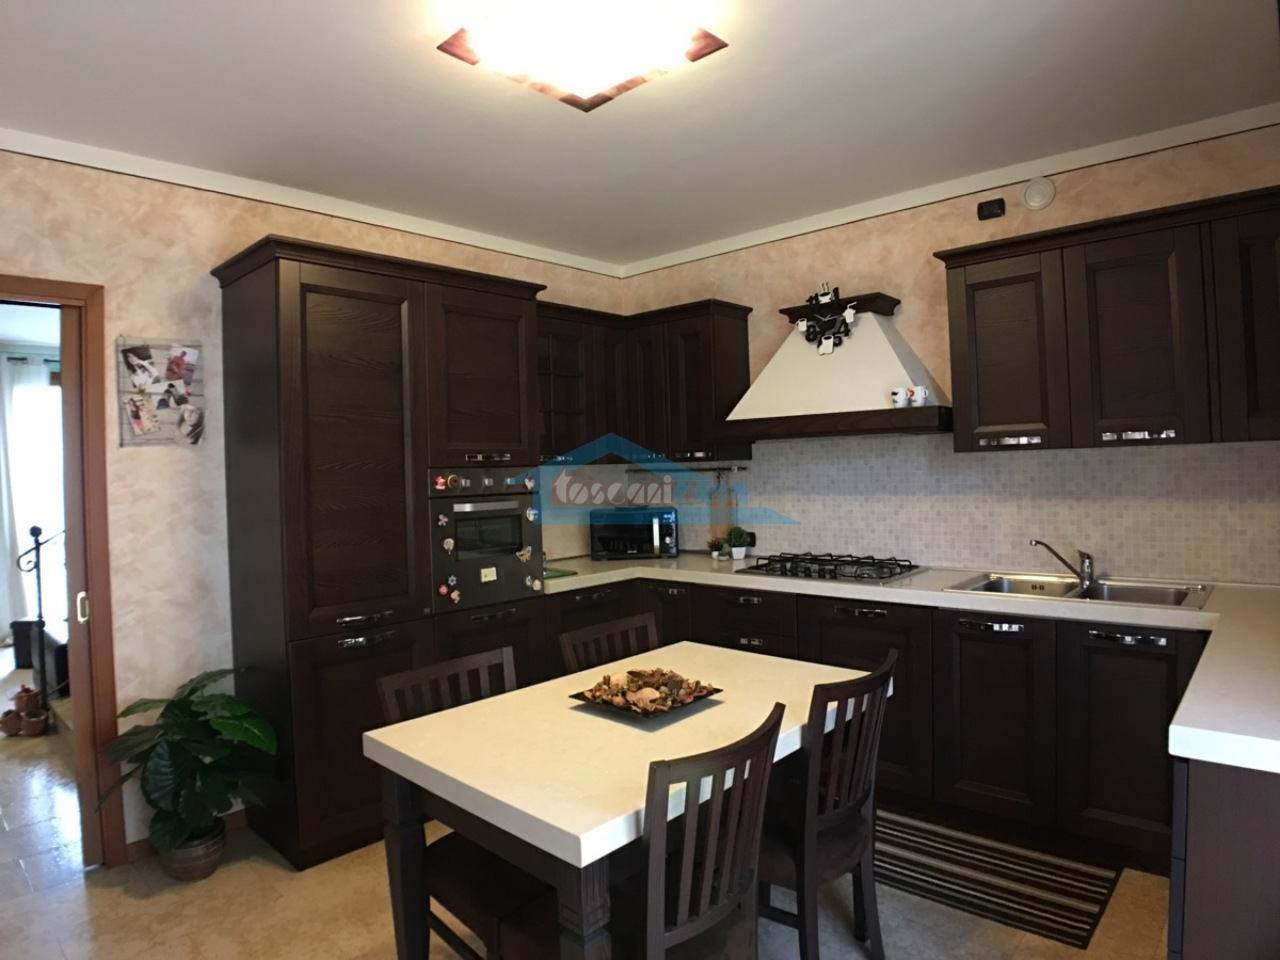 Cucina abitabile Villa a schiera  a Adro